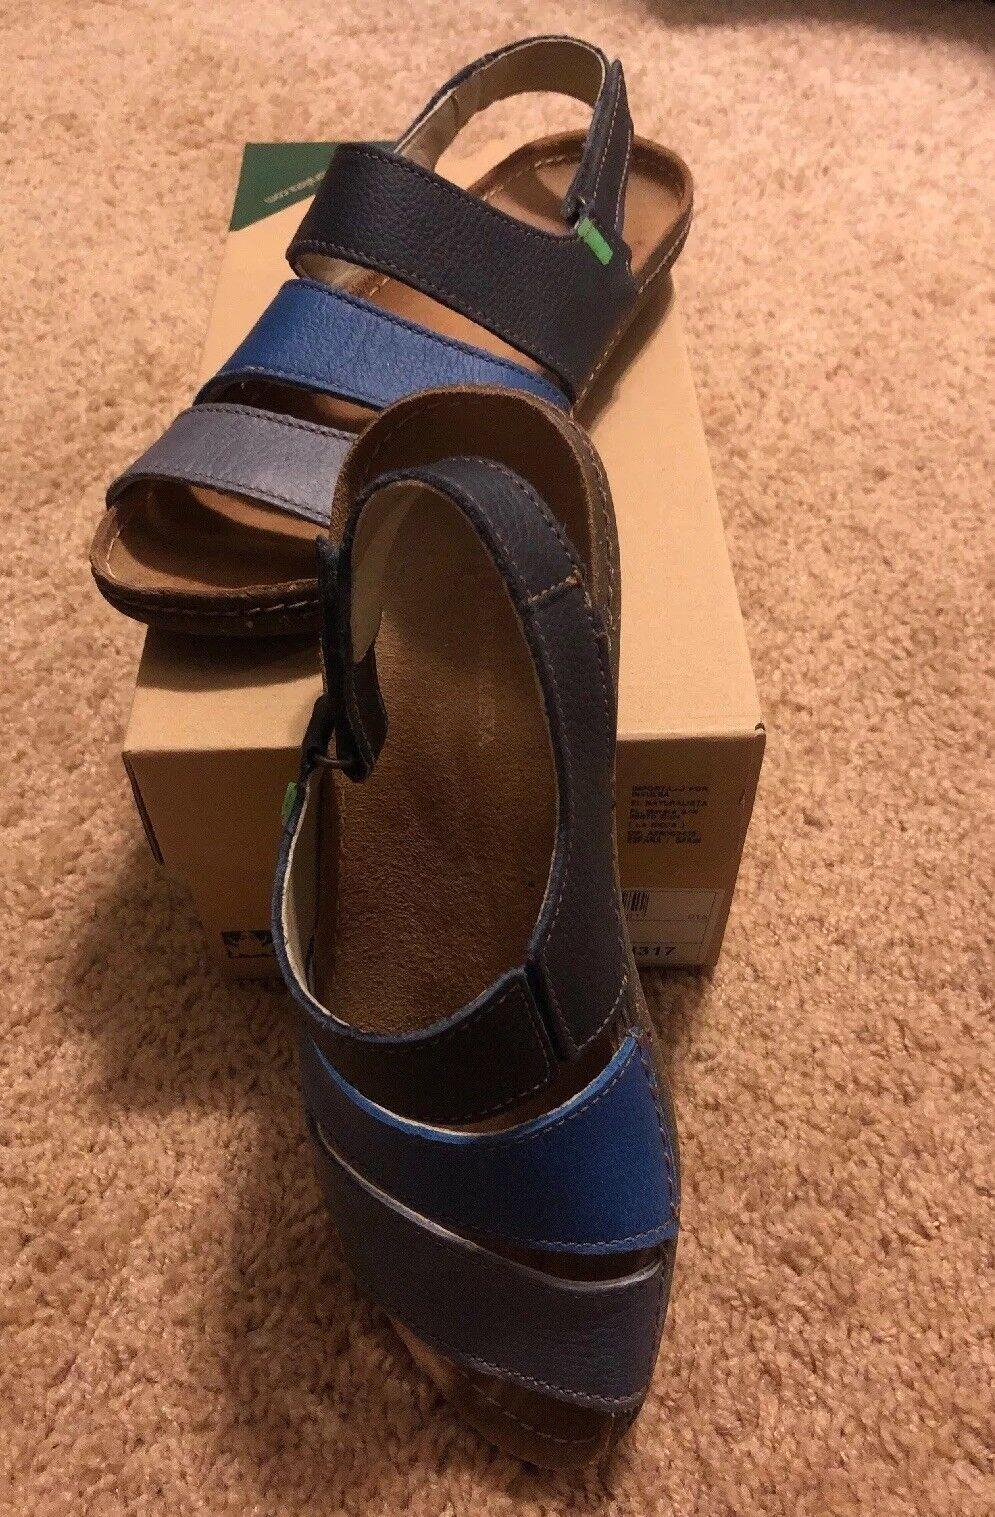 El Natura Lista Azul Sandalia para mujer Talla Talla Talla 37  la mejor oferta de tienda online